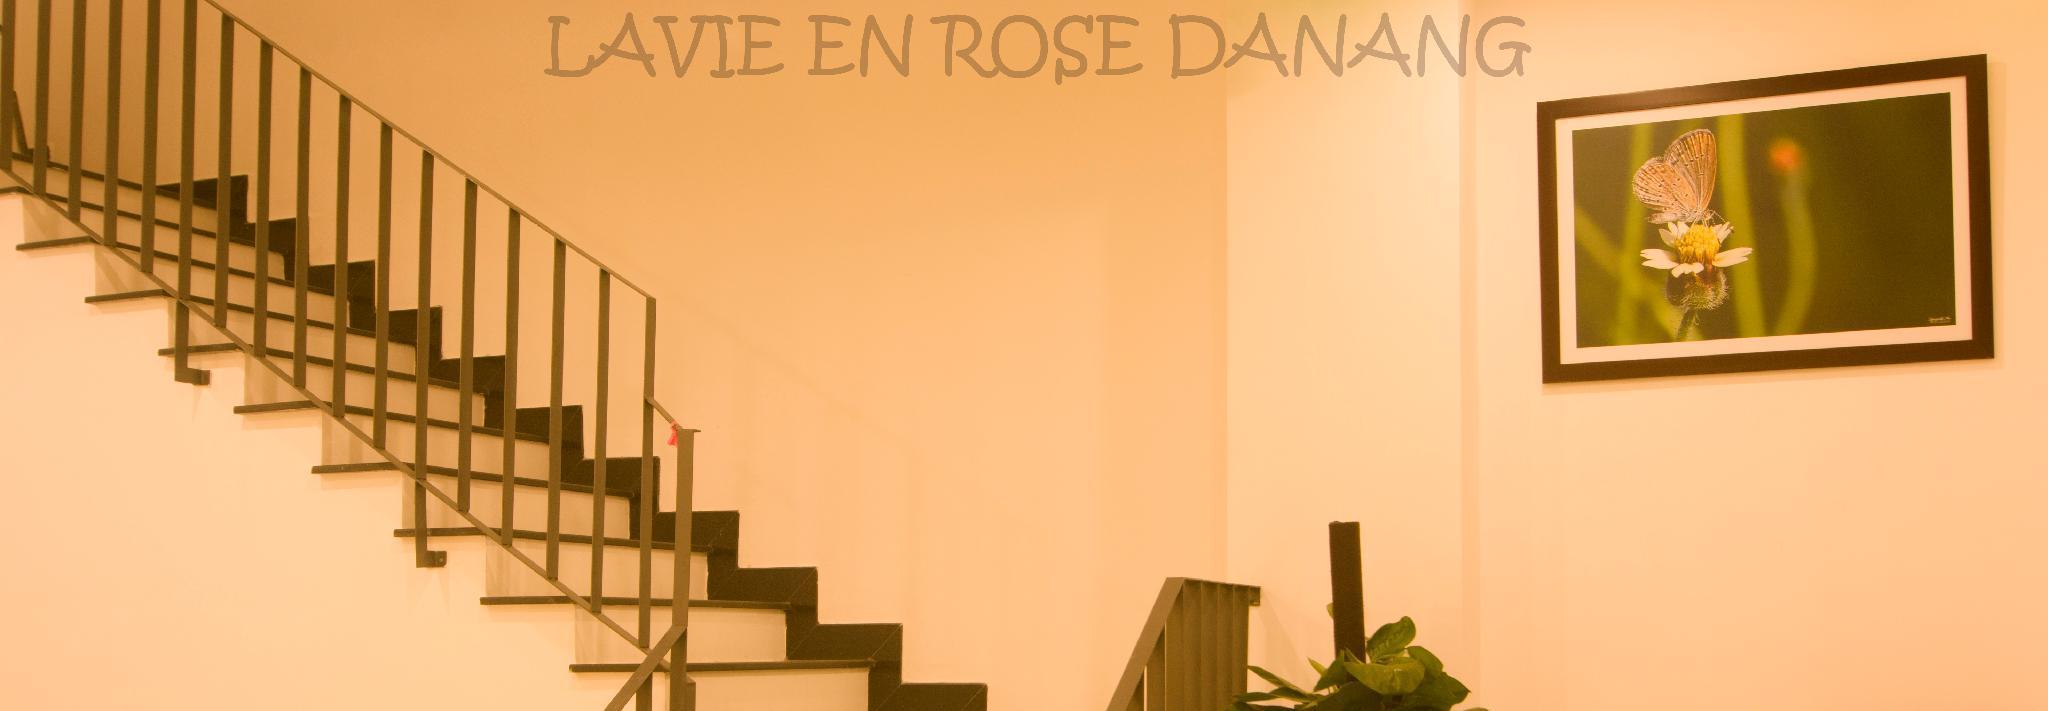 Lavie En Rose  4 2